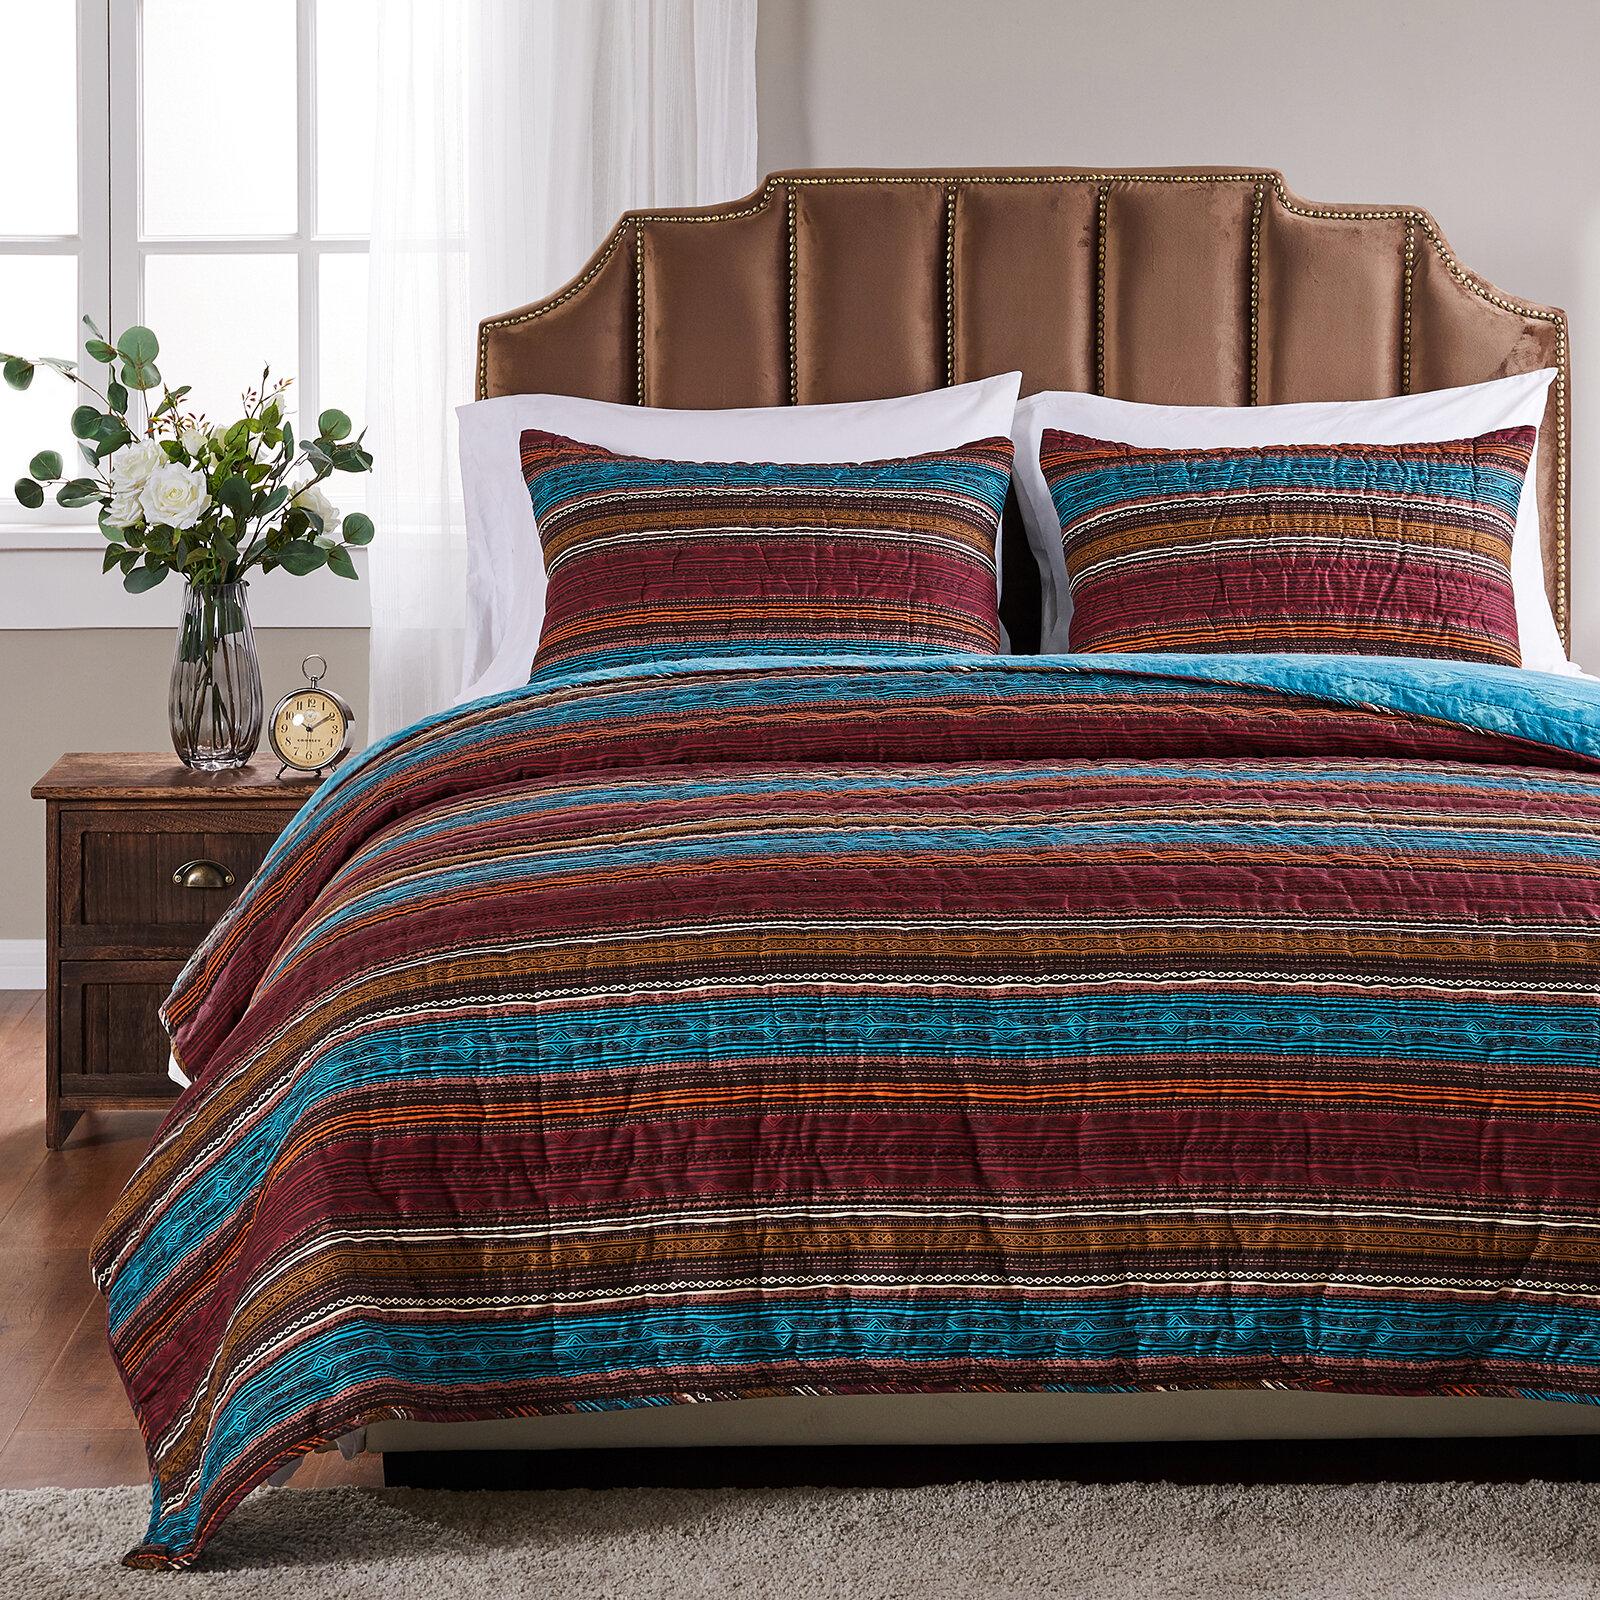 Millwood Pines Bannister Reversible Quilt Set Reviews Wayfair